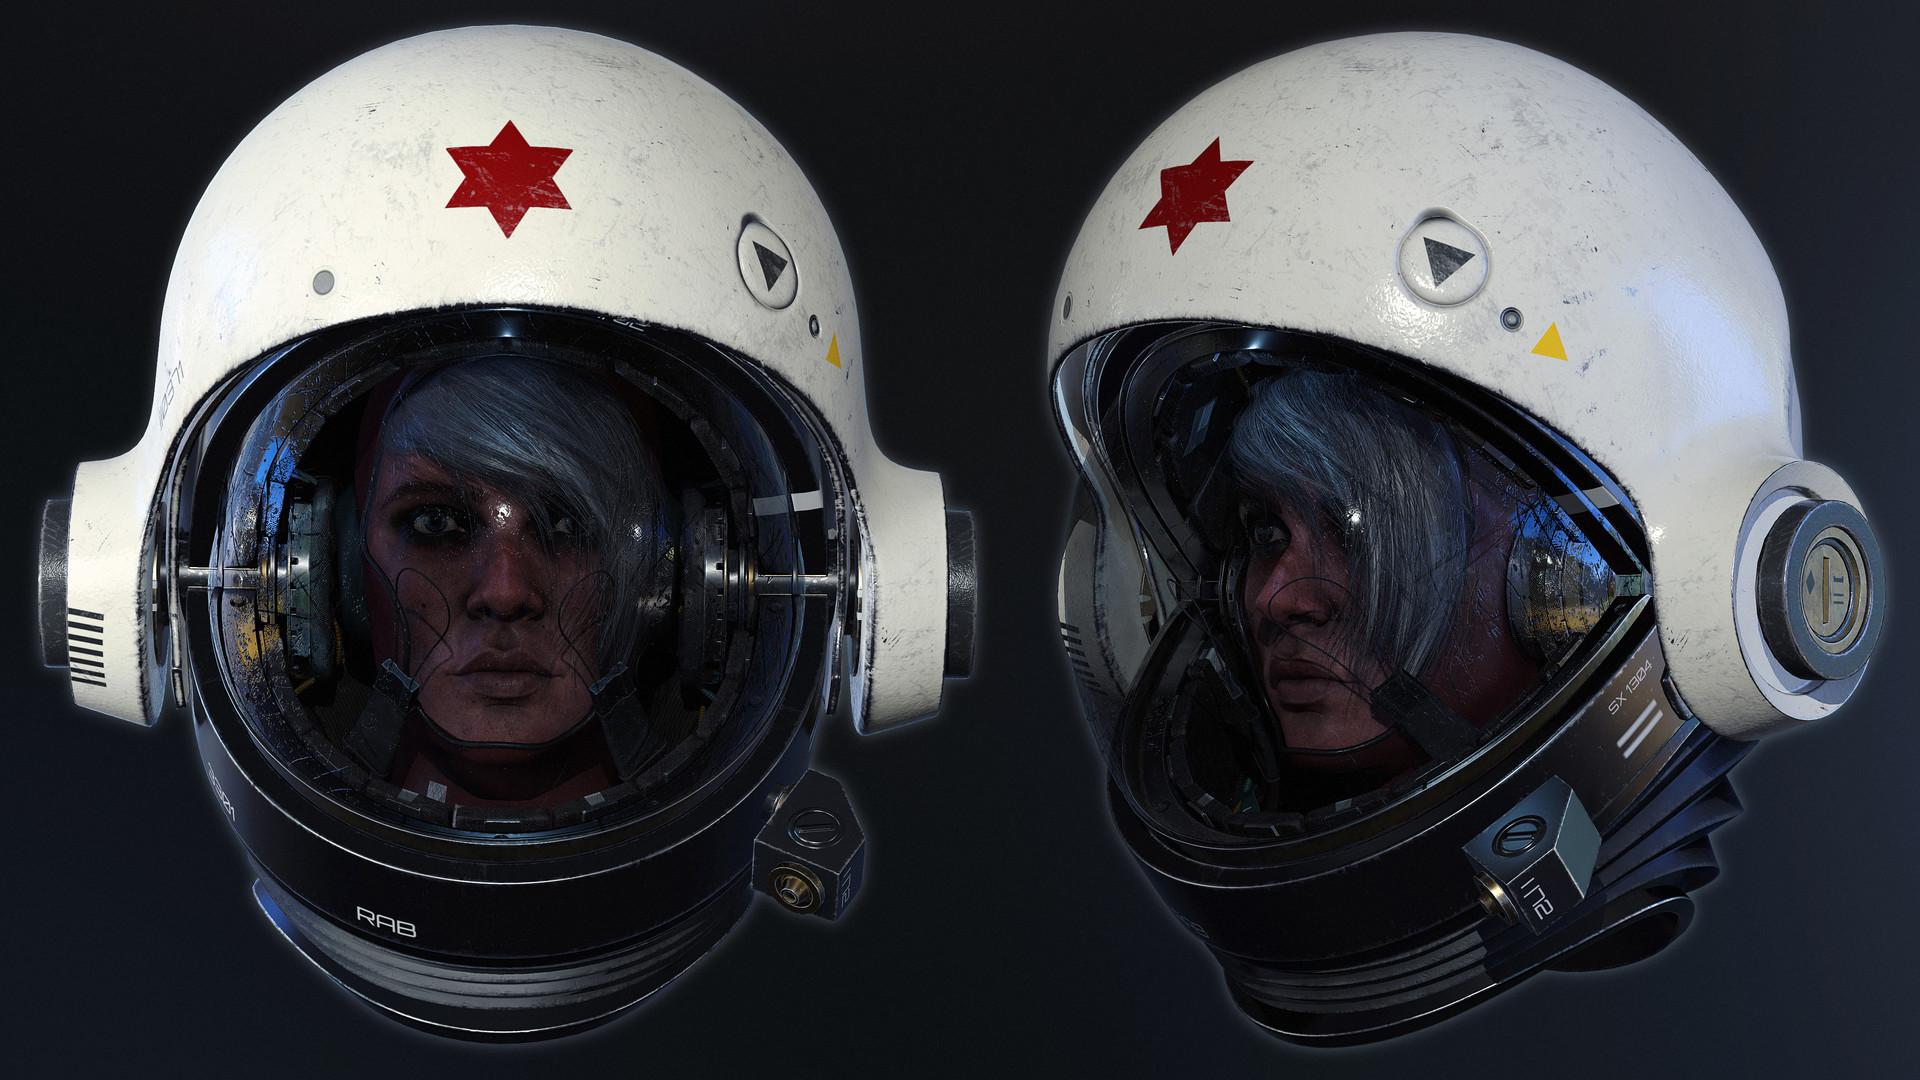 Картинки космонавта шлем что вроде